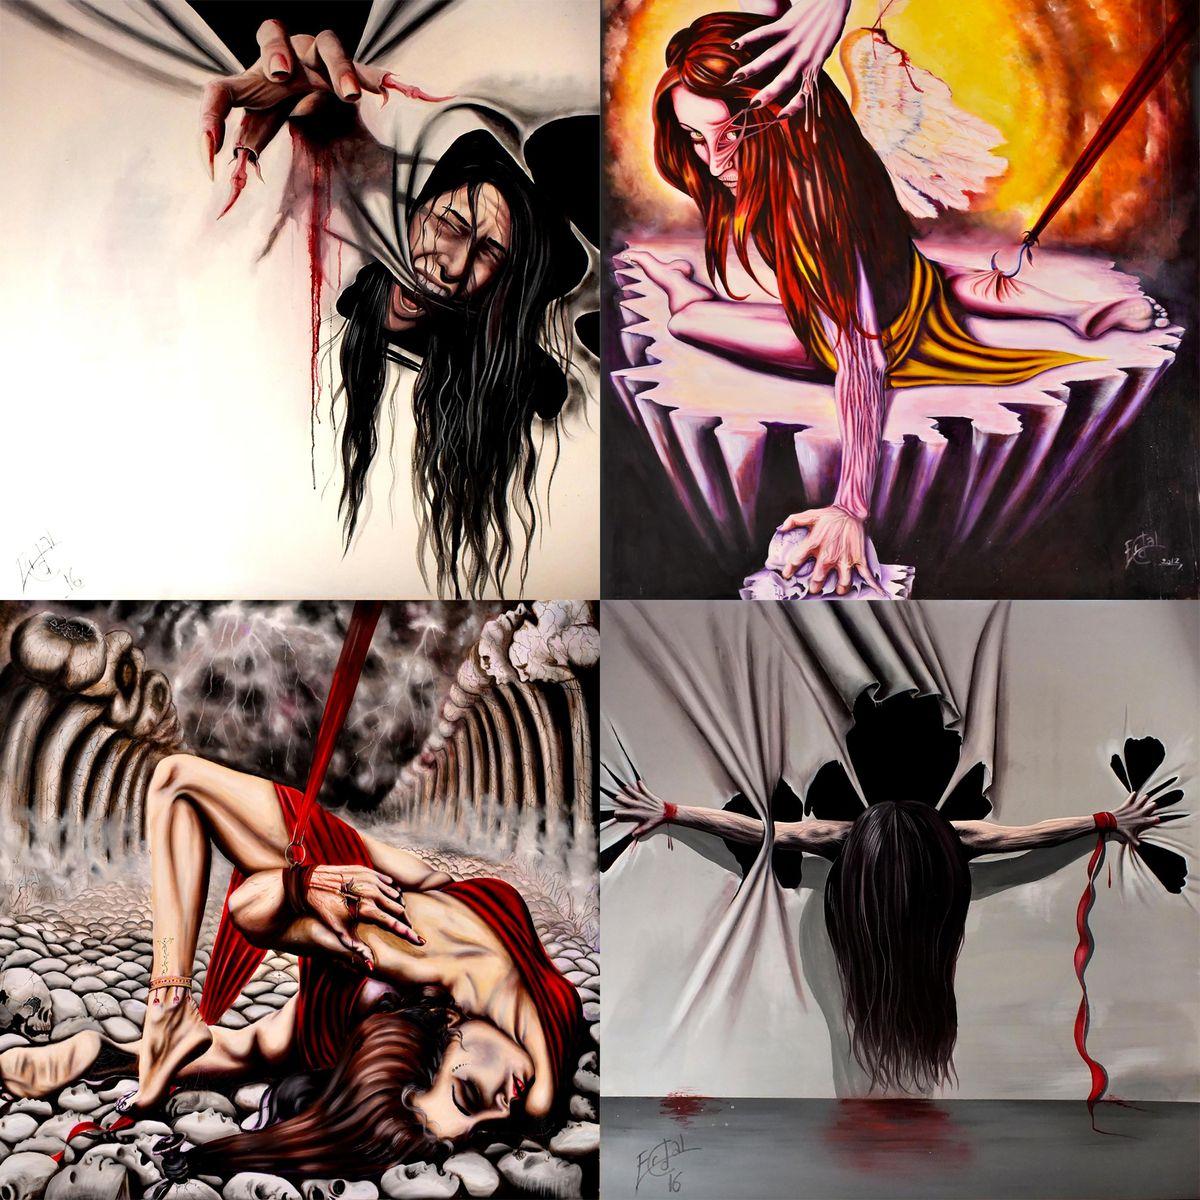 GALLERYMAK's Pinterest #sürrealizm Image created at 370702613068560227 -